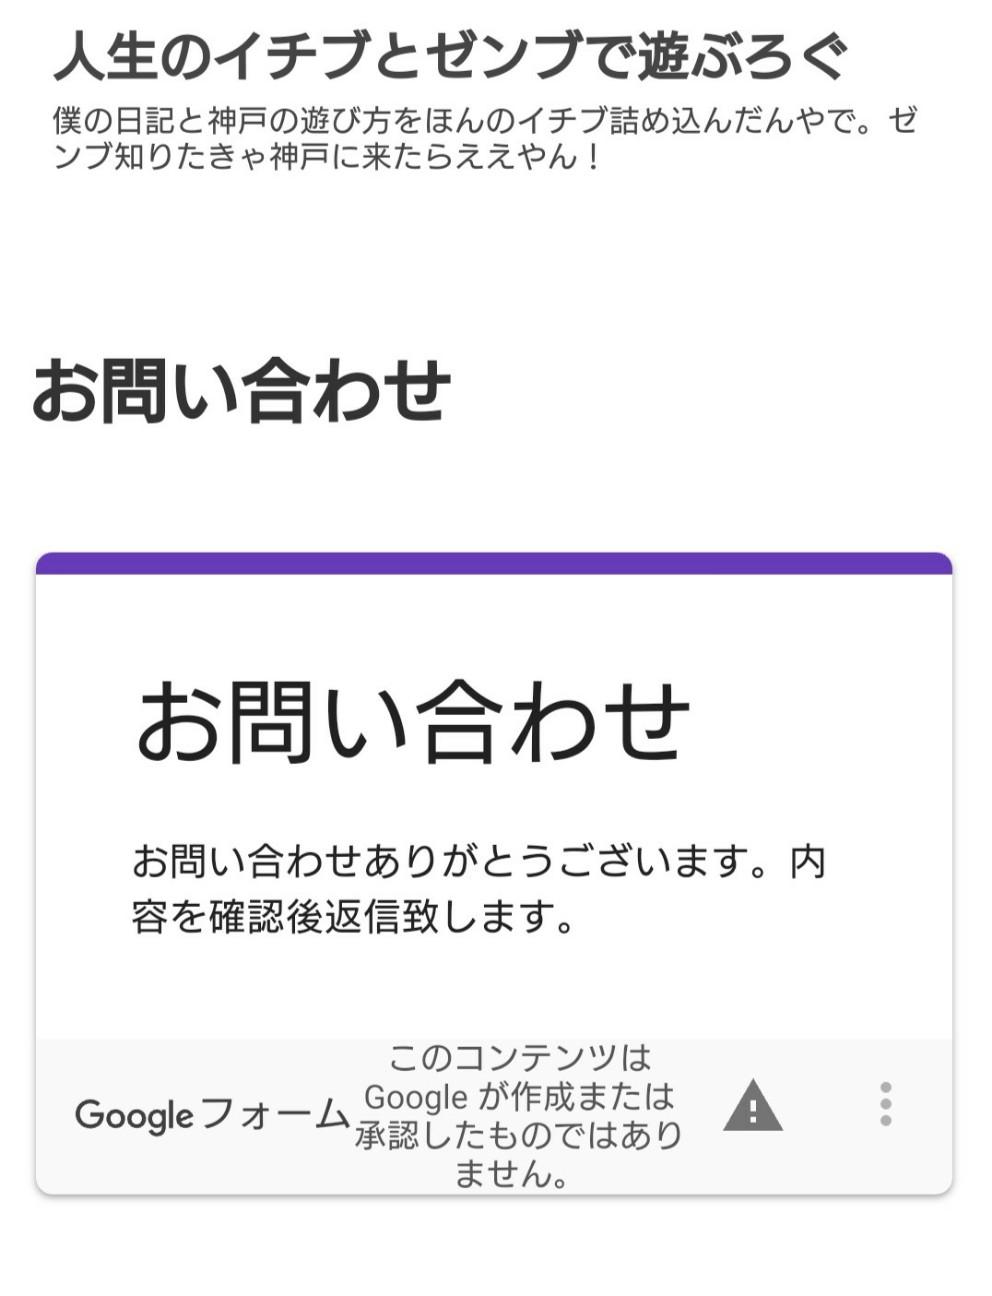 f:id:a-matsuno0503:20190207142551j:image